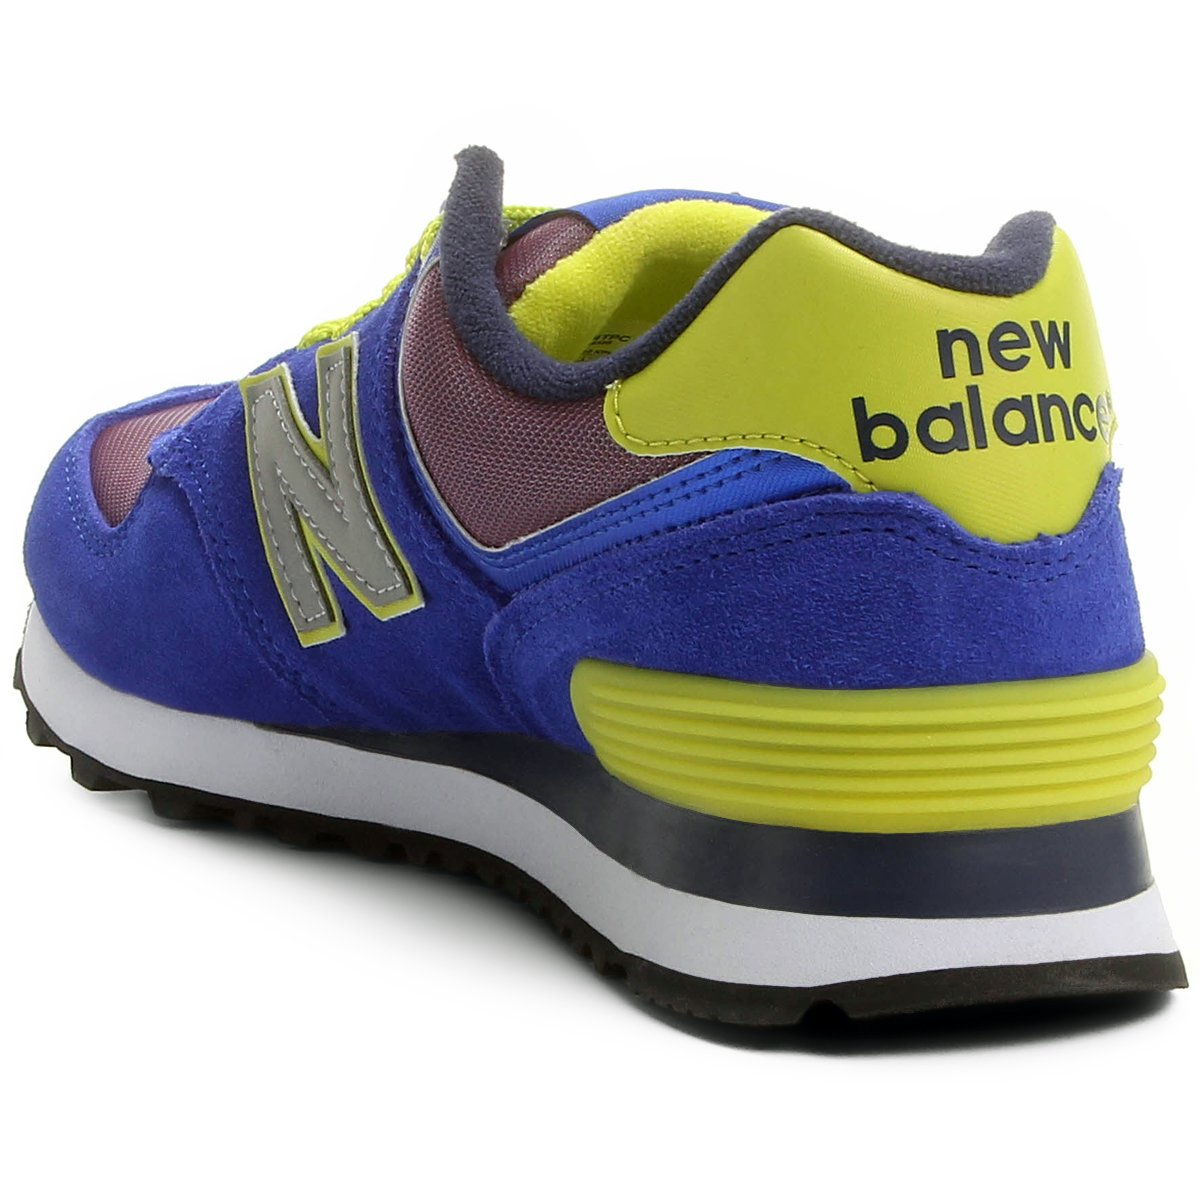 Tênis New Balance 574 Tiki - Azul e Cinza - Compre Agora   Netshoes 4389d1438c